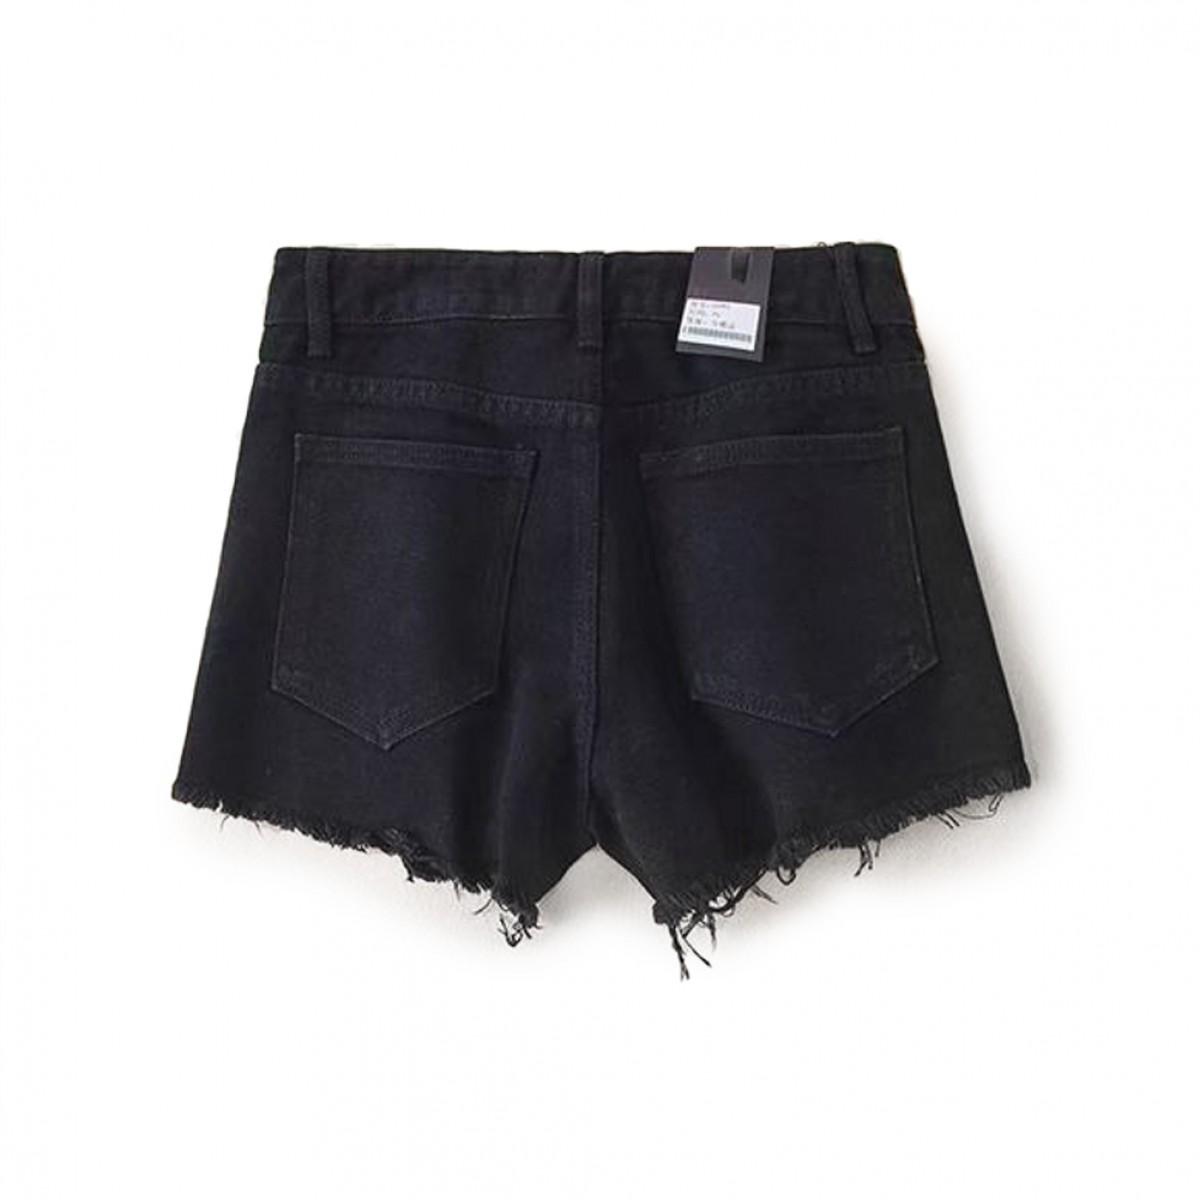 Womens Distressed Black Denim Shorts | LATICCI